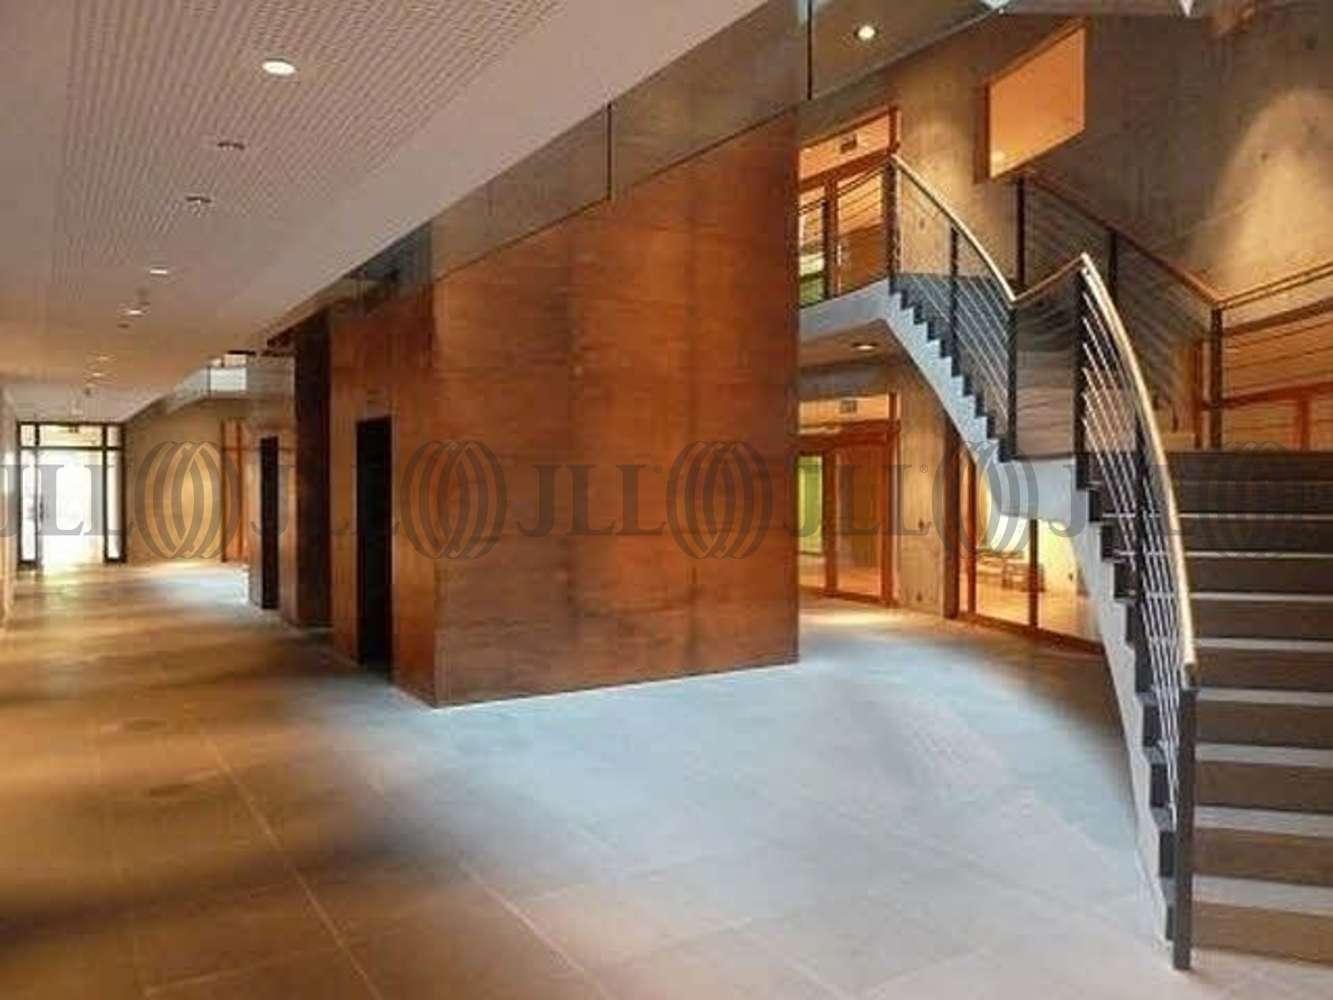 Büros Frankfurt am main, 60439 - Büro - Frankfurt am Main - F2276 - 10804471